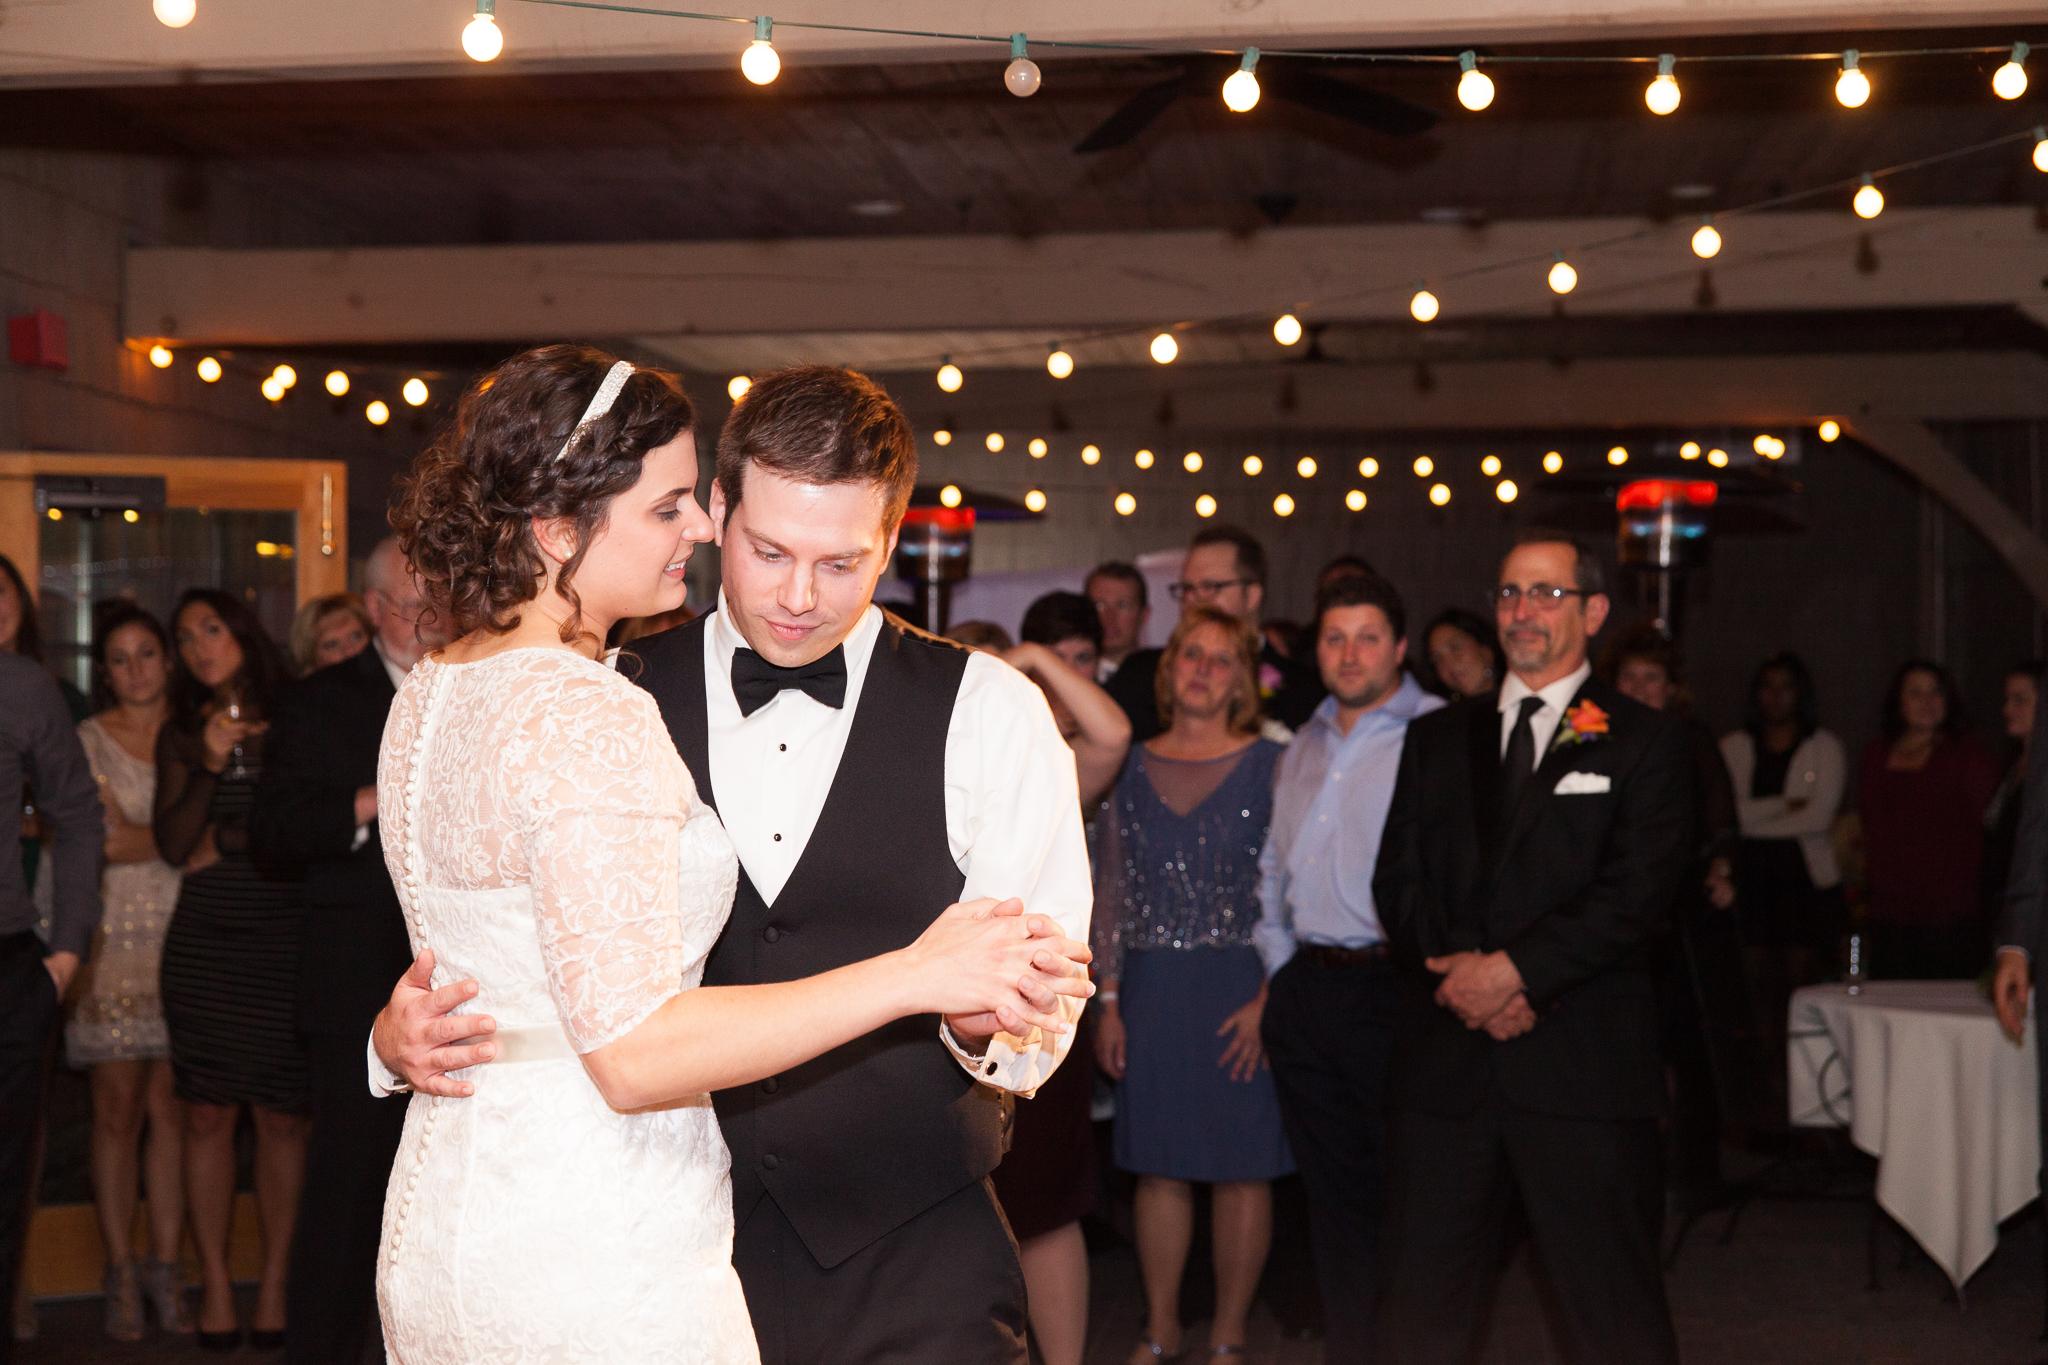 camuglia-whomstudio-chelsea_and_andy-nycphotographer-wedding-brooklyn-buffalo-timberlodge-112-0745.jpg